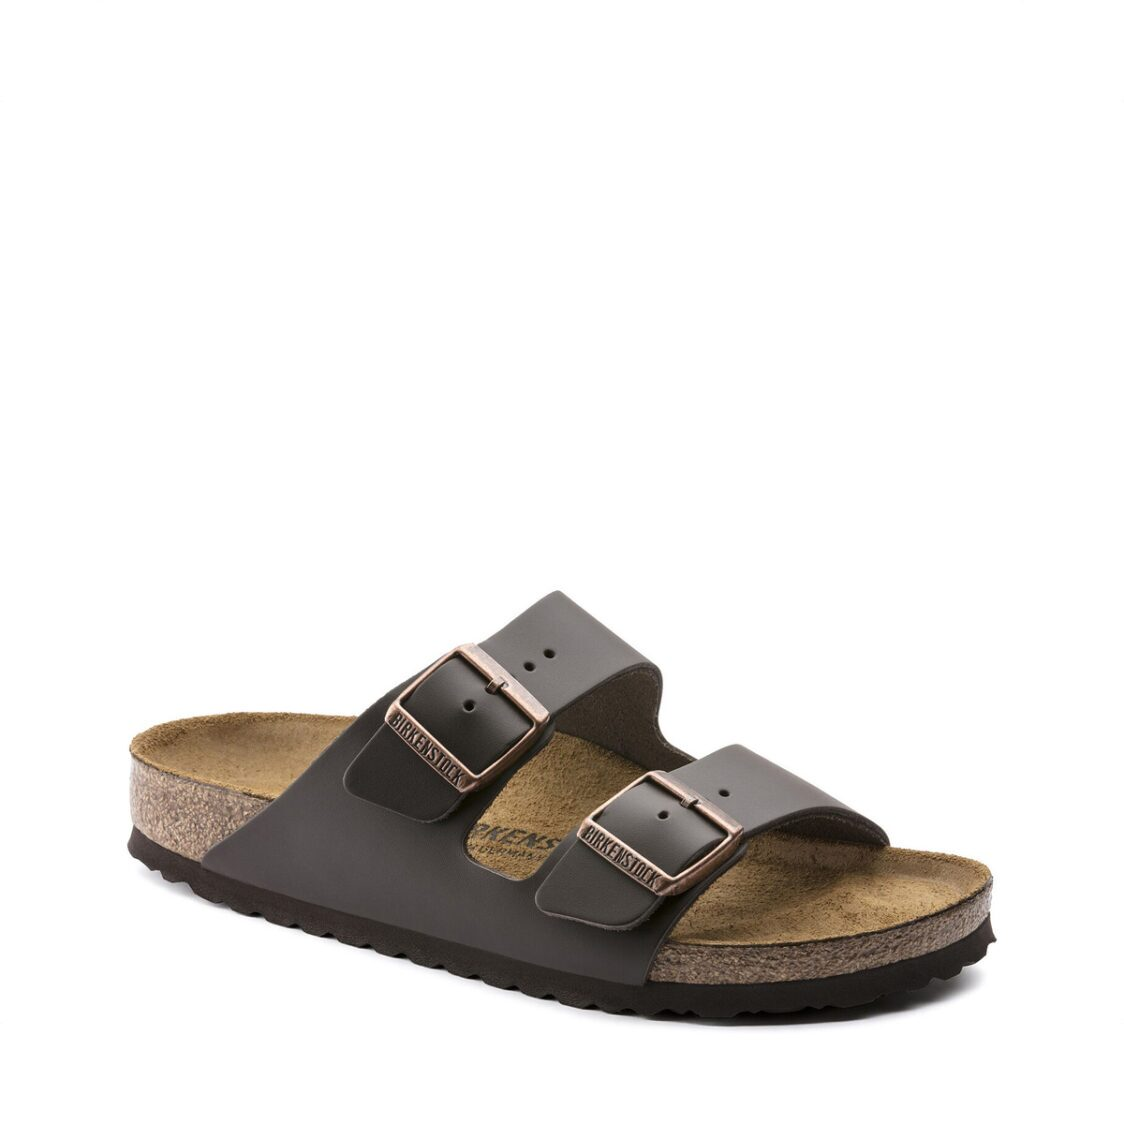 Birkenstock Arizona Natural Leather Unisex Regular Width Sandals Dark Brown